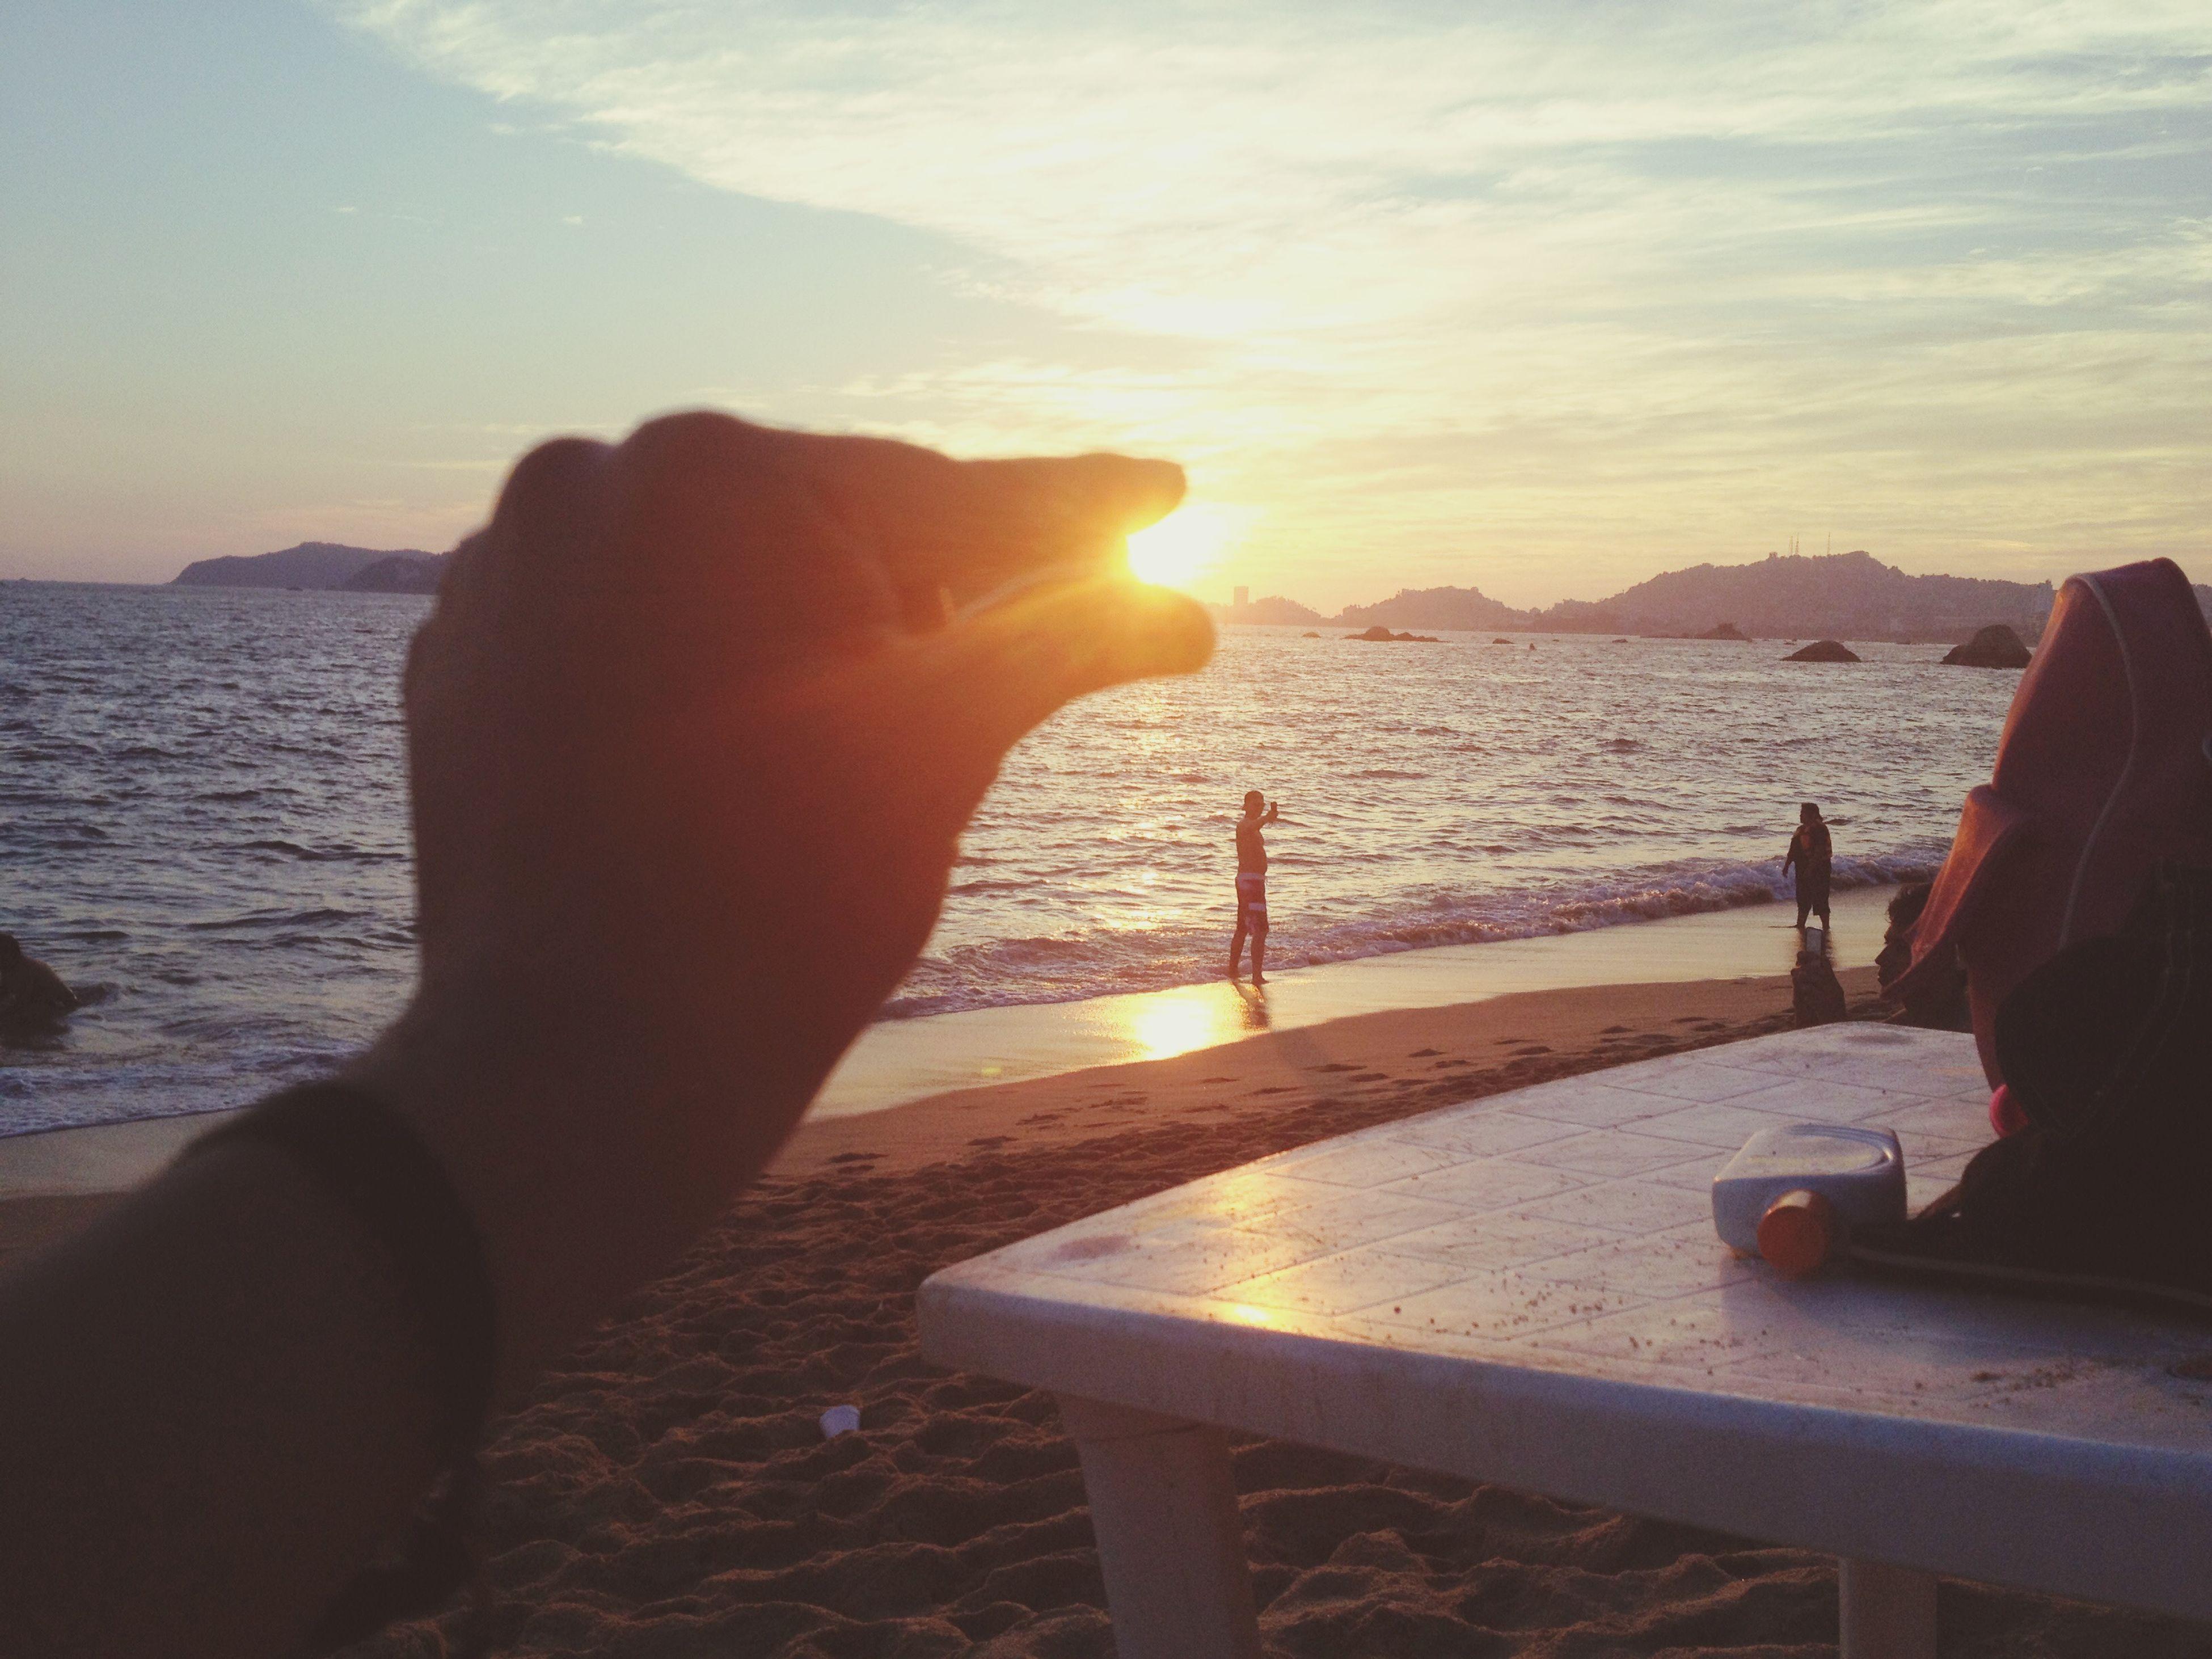 sea, sunset, water, sky, scenics, beach, sun, tranquil scene, beauty in nature, tranquility, horizon over water, silhouette, nature, mountain, orange color, sunlight, idyllic, shore